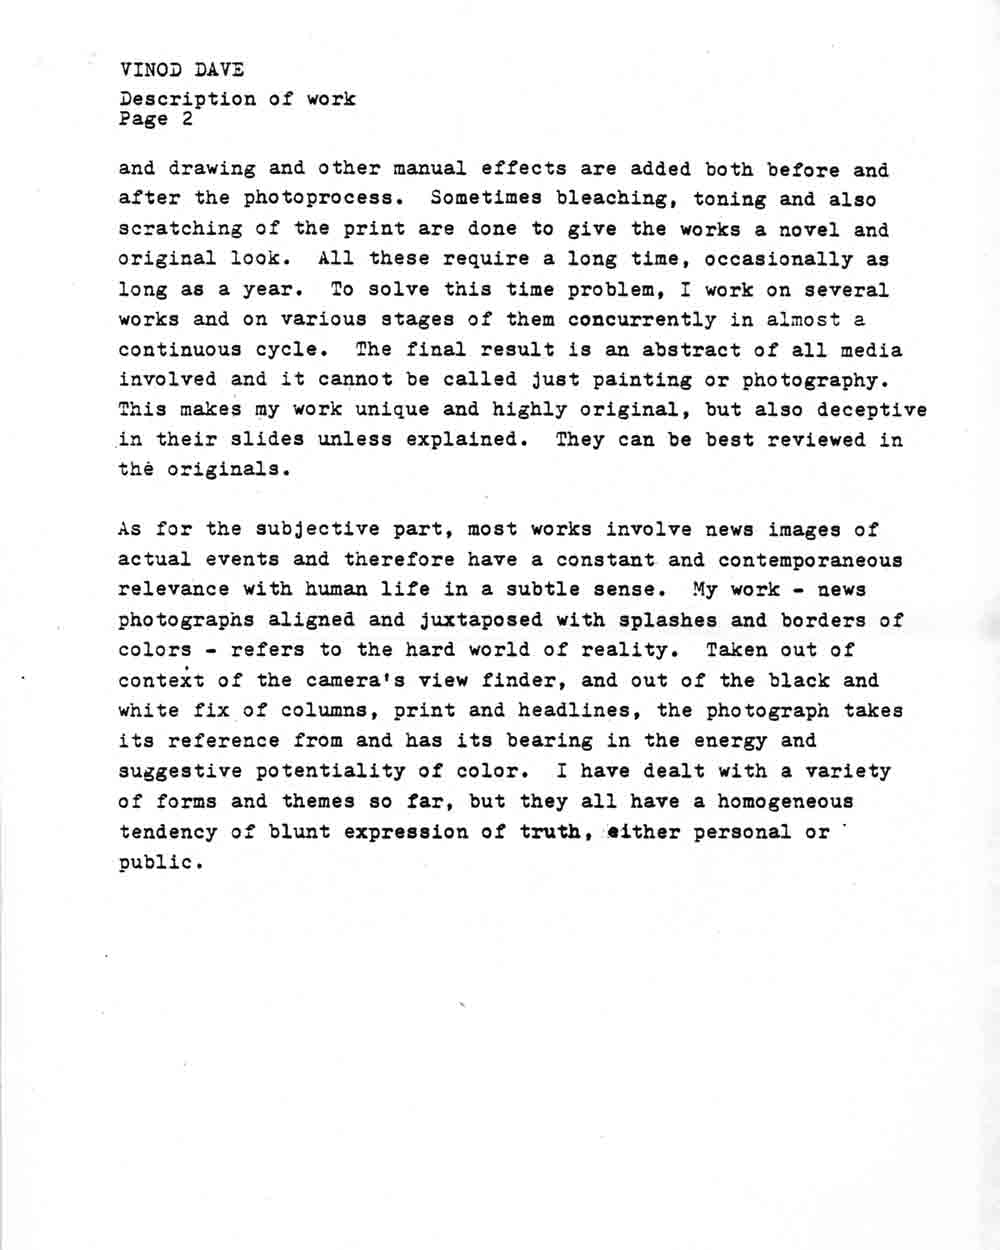 One Line Artist Statement : Dave vinod selected document artasiamerica a